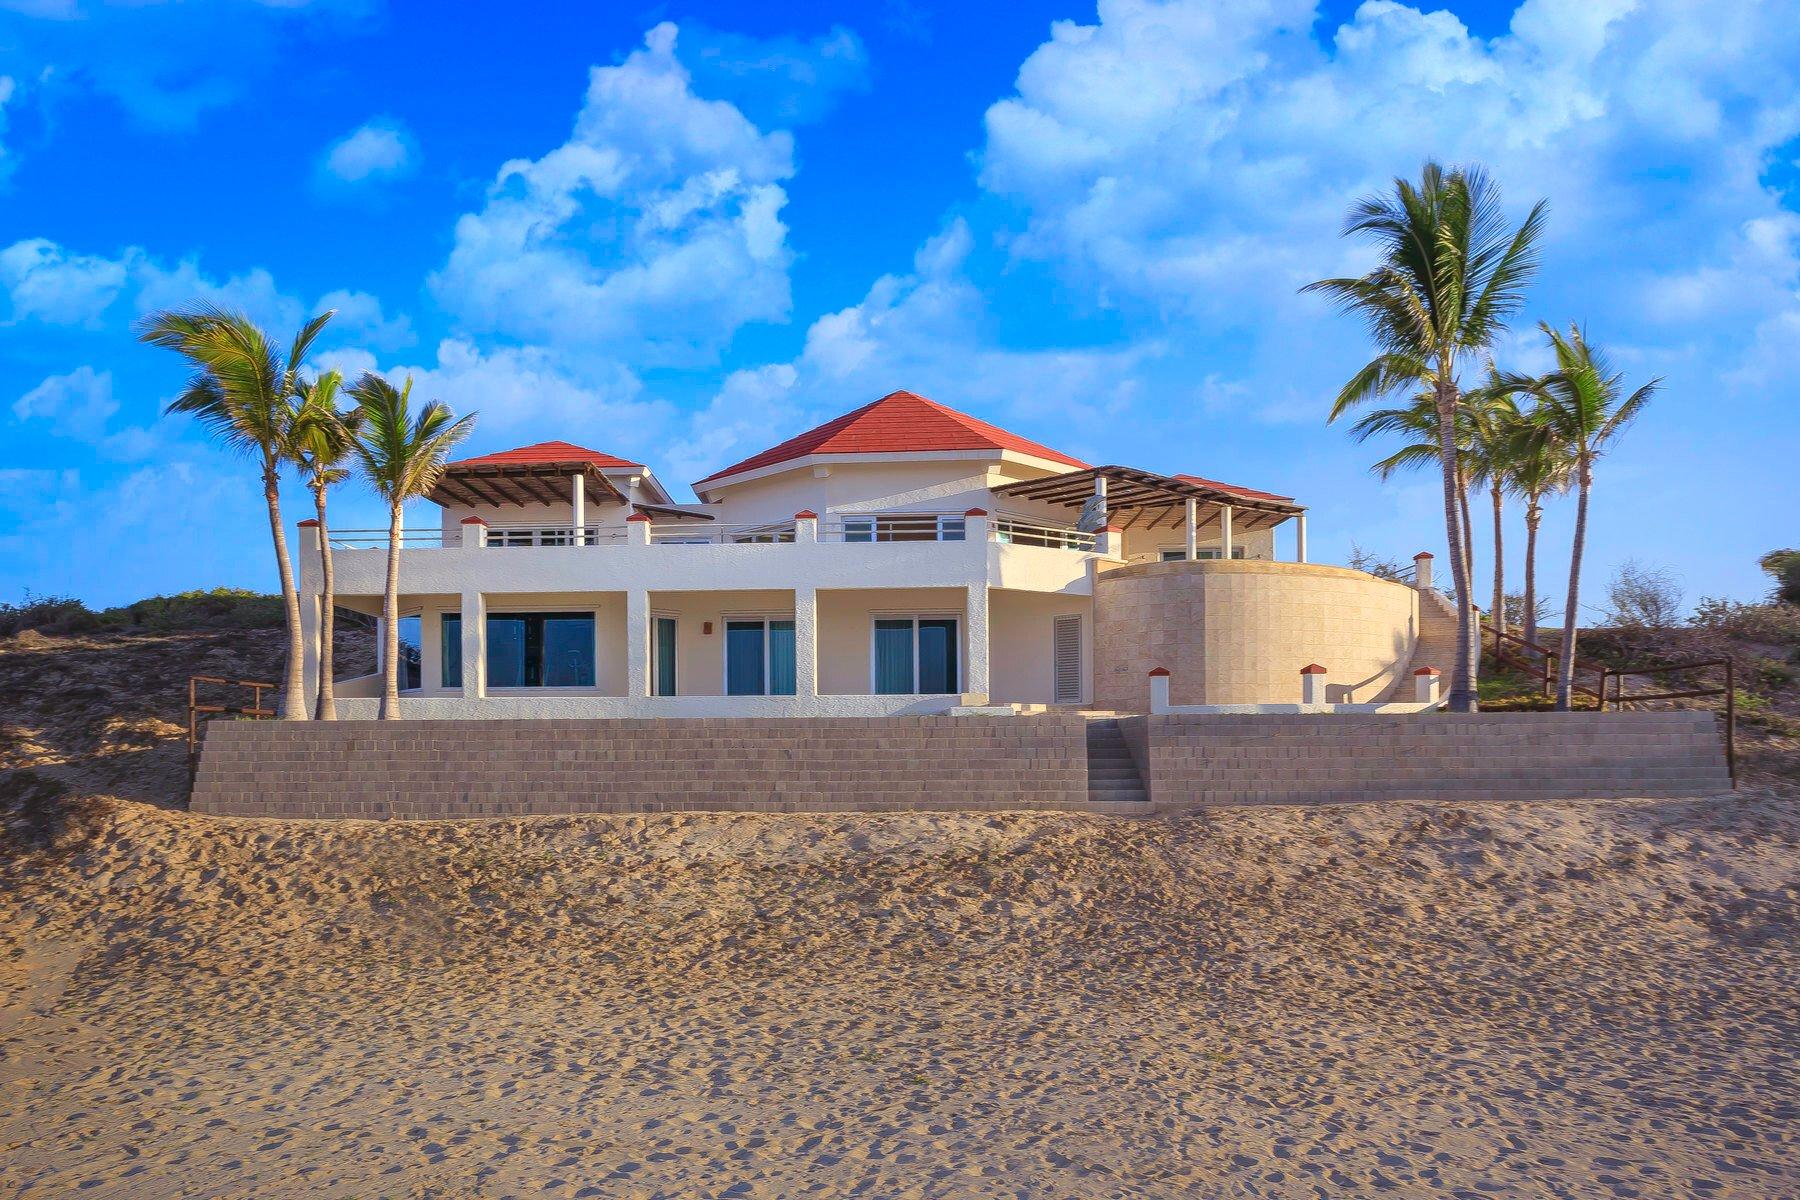 House in Baja California Sur, Mexico 1 - 11076189